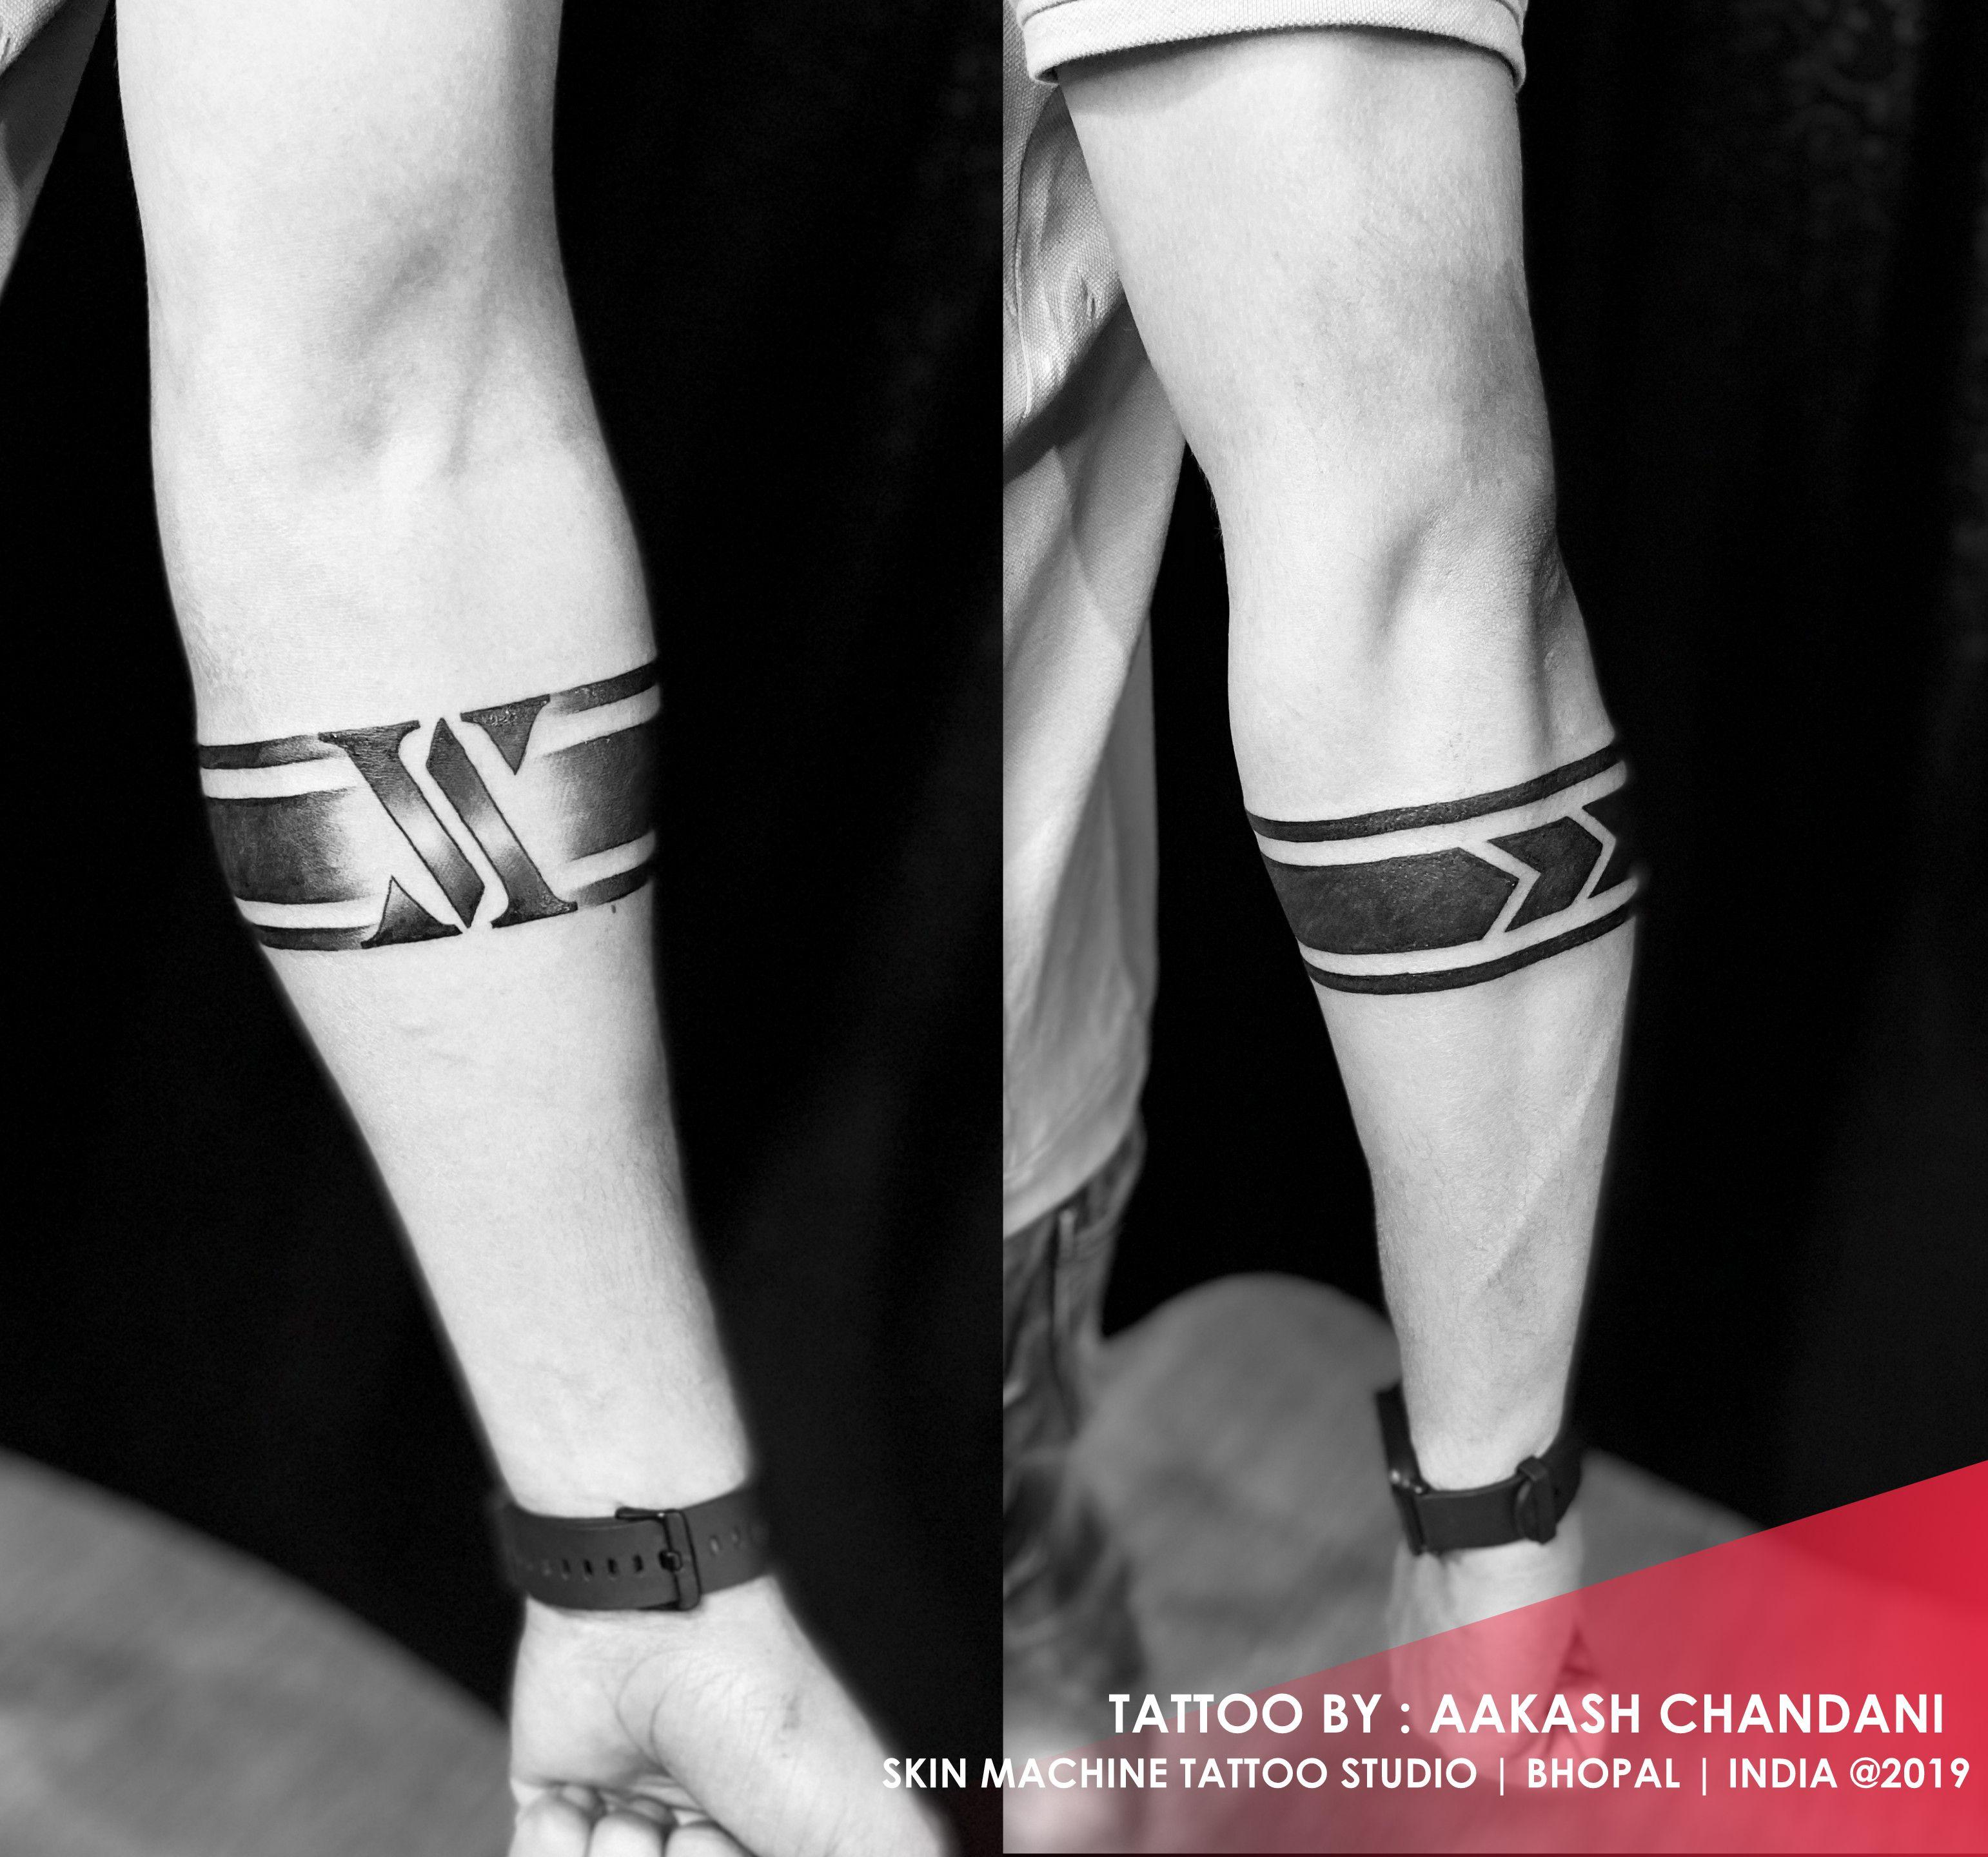 Armband Tattoo Forearm Band Tattoos Band Tattoos For Men Band Tattoo Designs